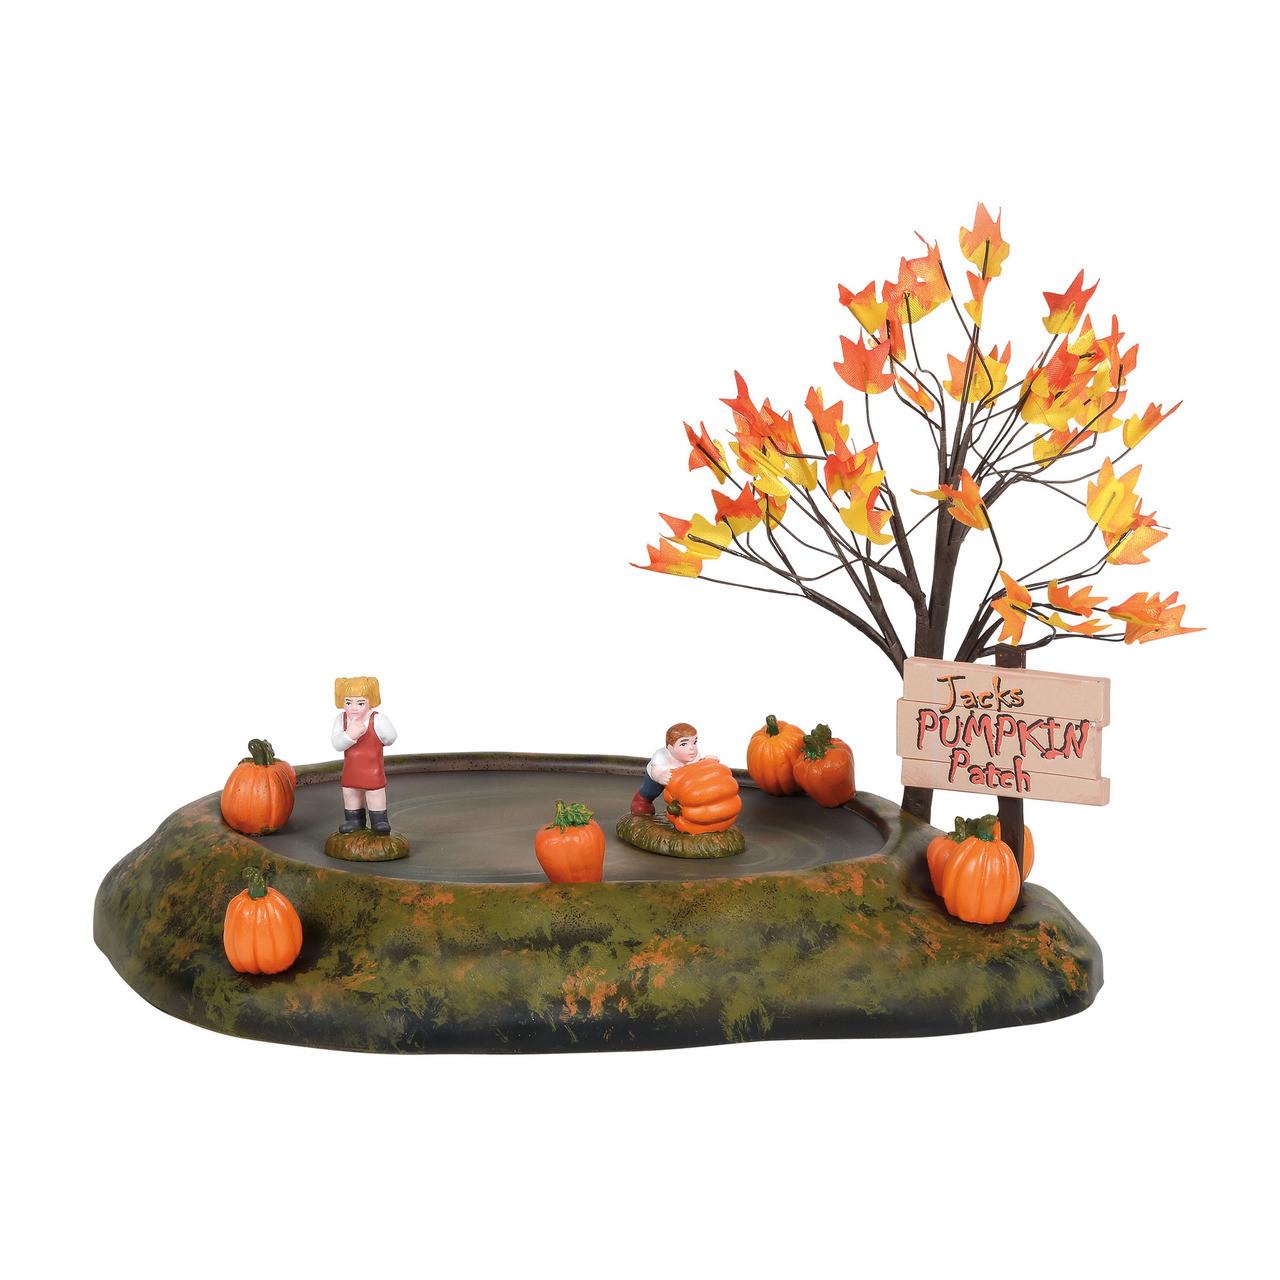 Department 56 Halloween Village Patty/'s Pumpkin Patch 4 Piece Set 6005479 New